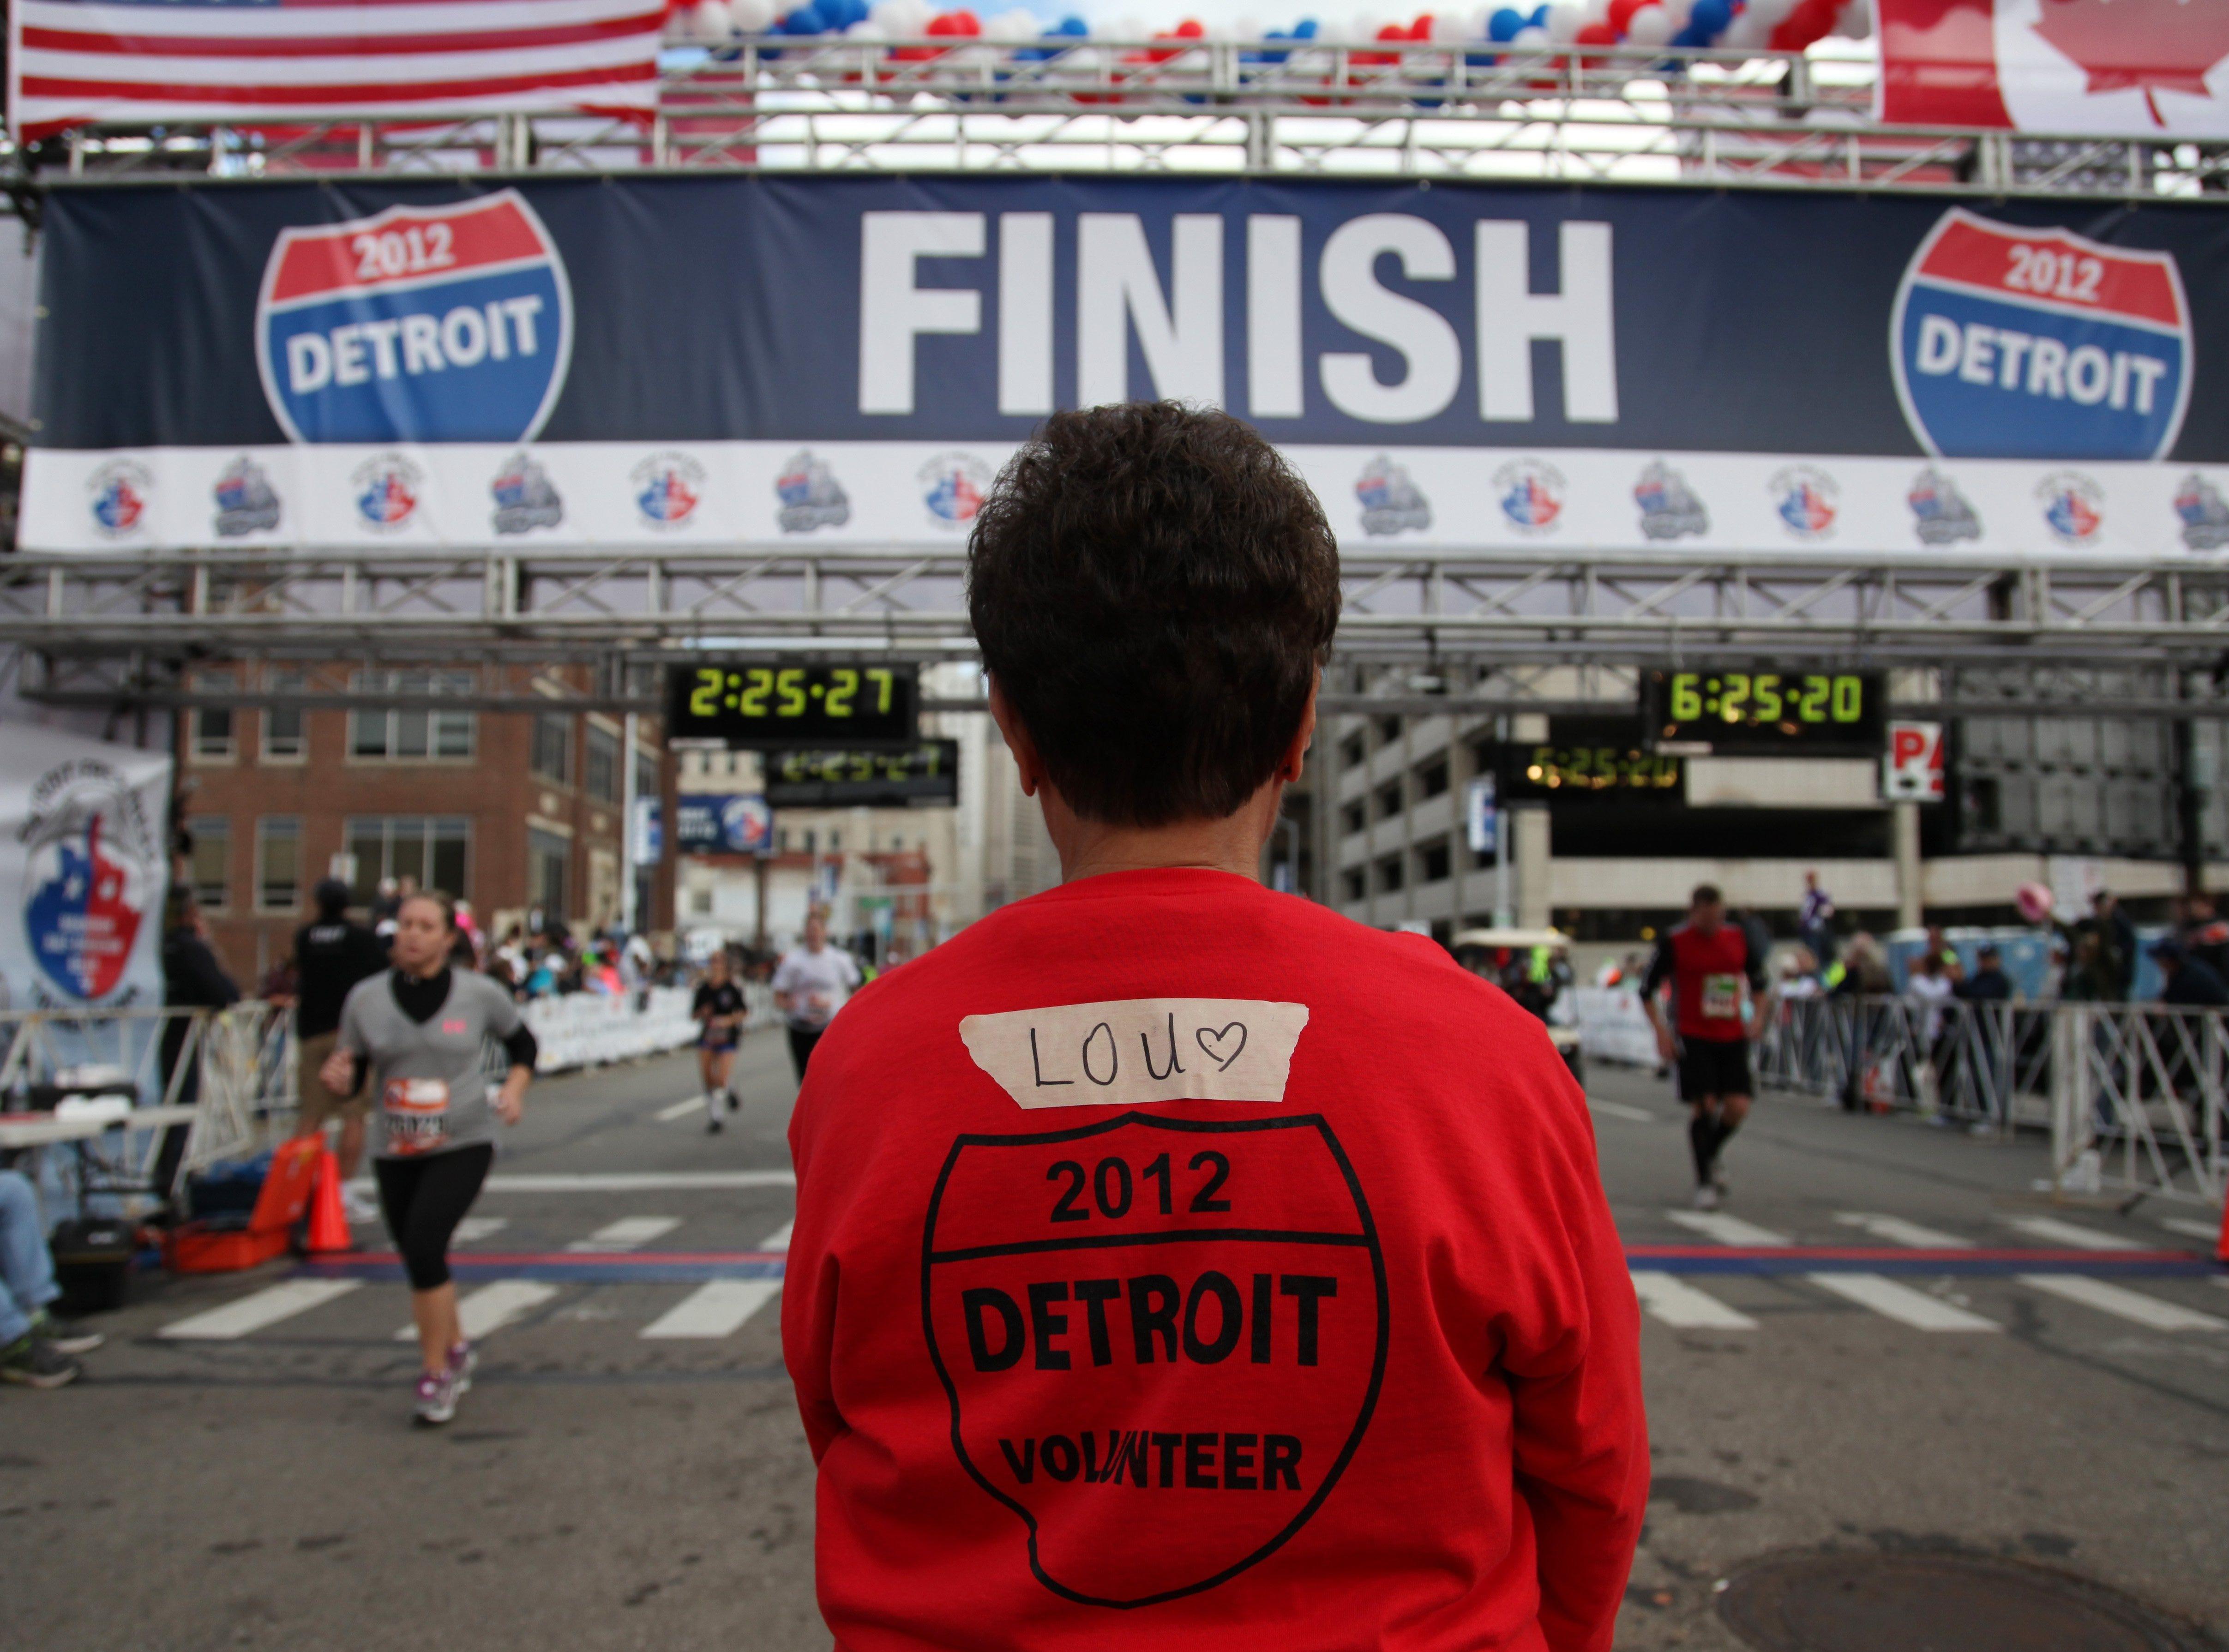 Race volunteer Lou Marossy works the finish line at the Detroit Free Press/Talmer Bank Marathon in Detroit, Sunday, Oct. 21, 2012.